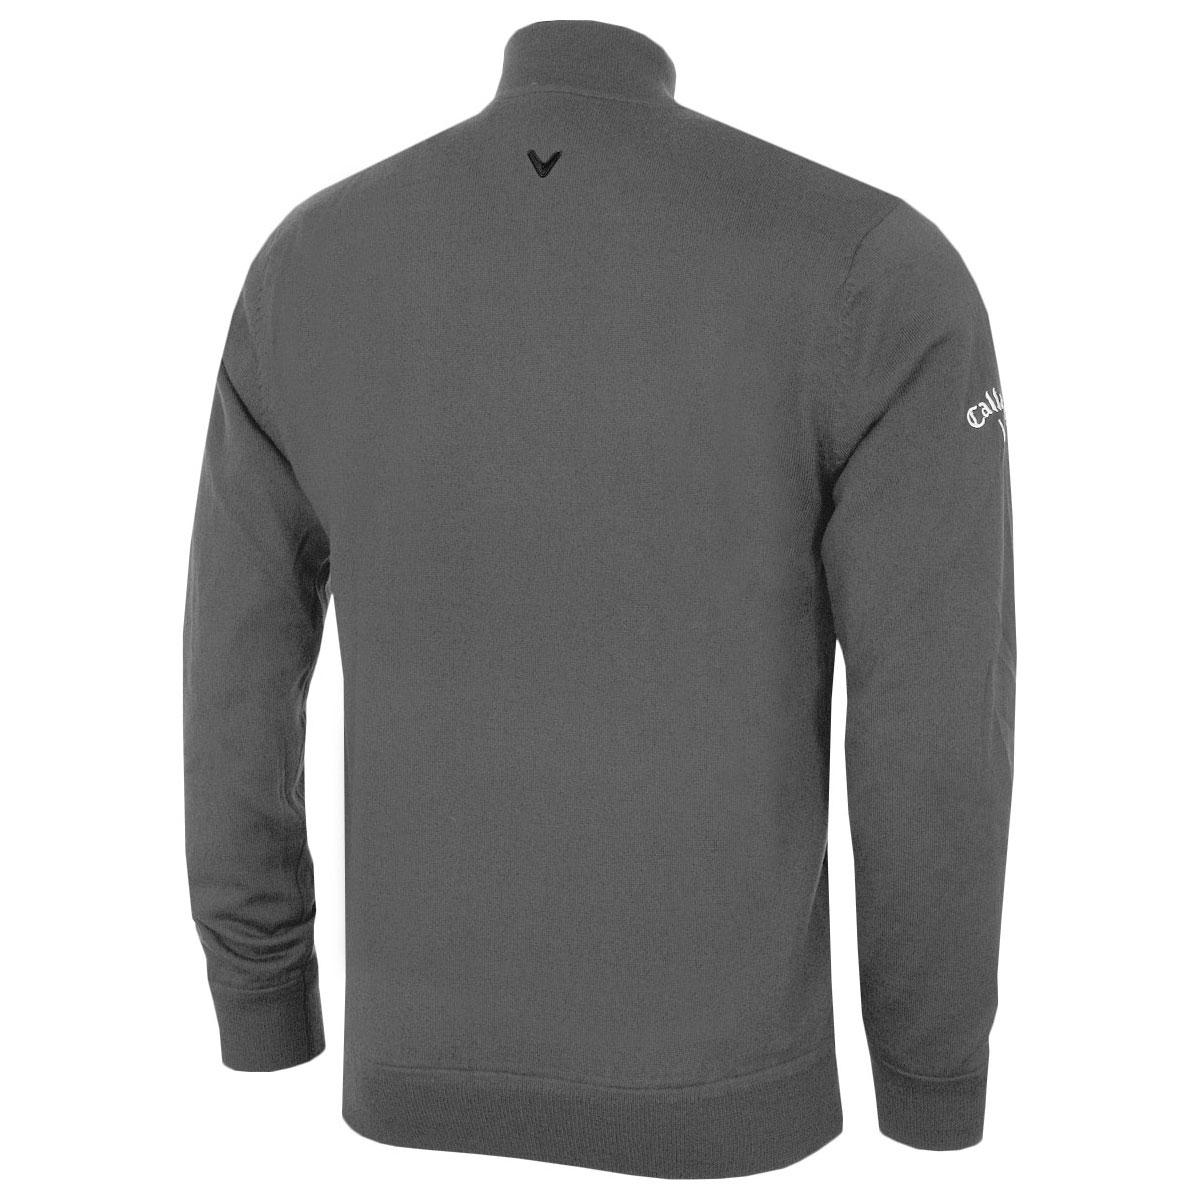 Callaway-Golf-Mens-1-4-Zip-Mock-Merino-Windproof-Sweater-Pullover-43-OFF-RRP thumbnail 21